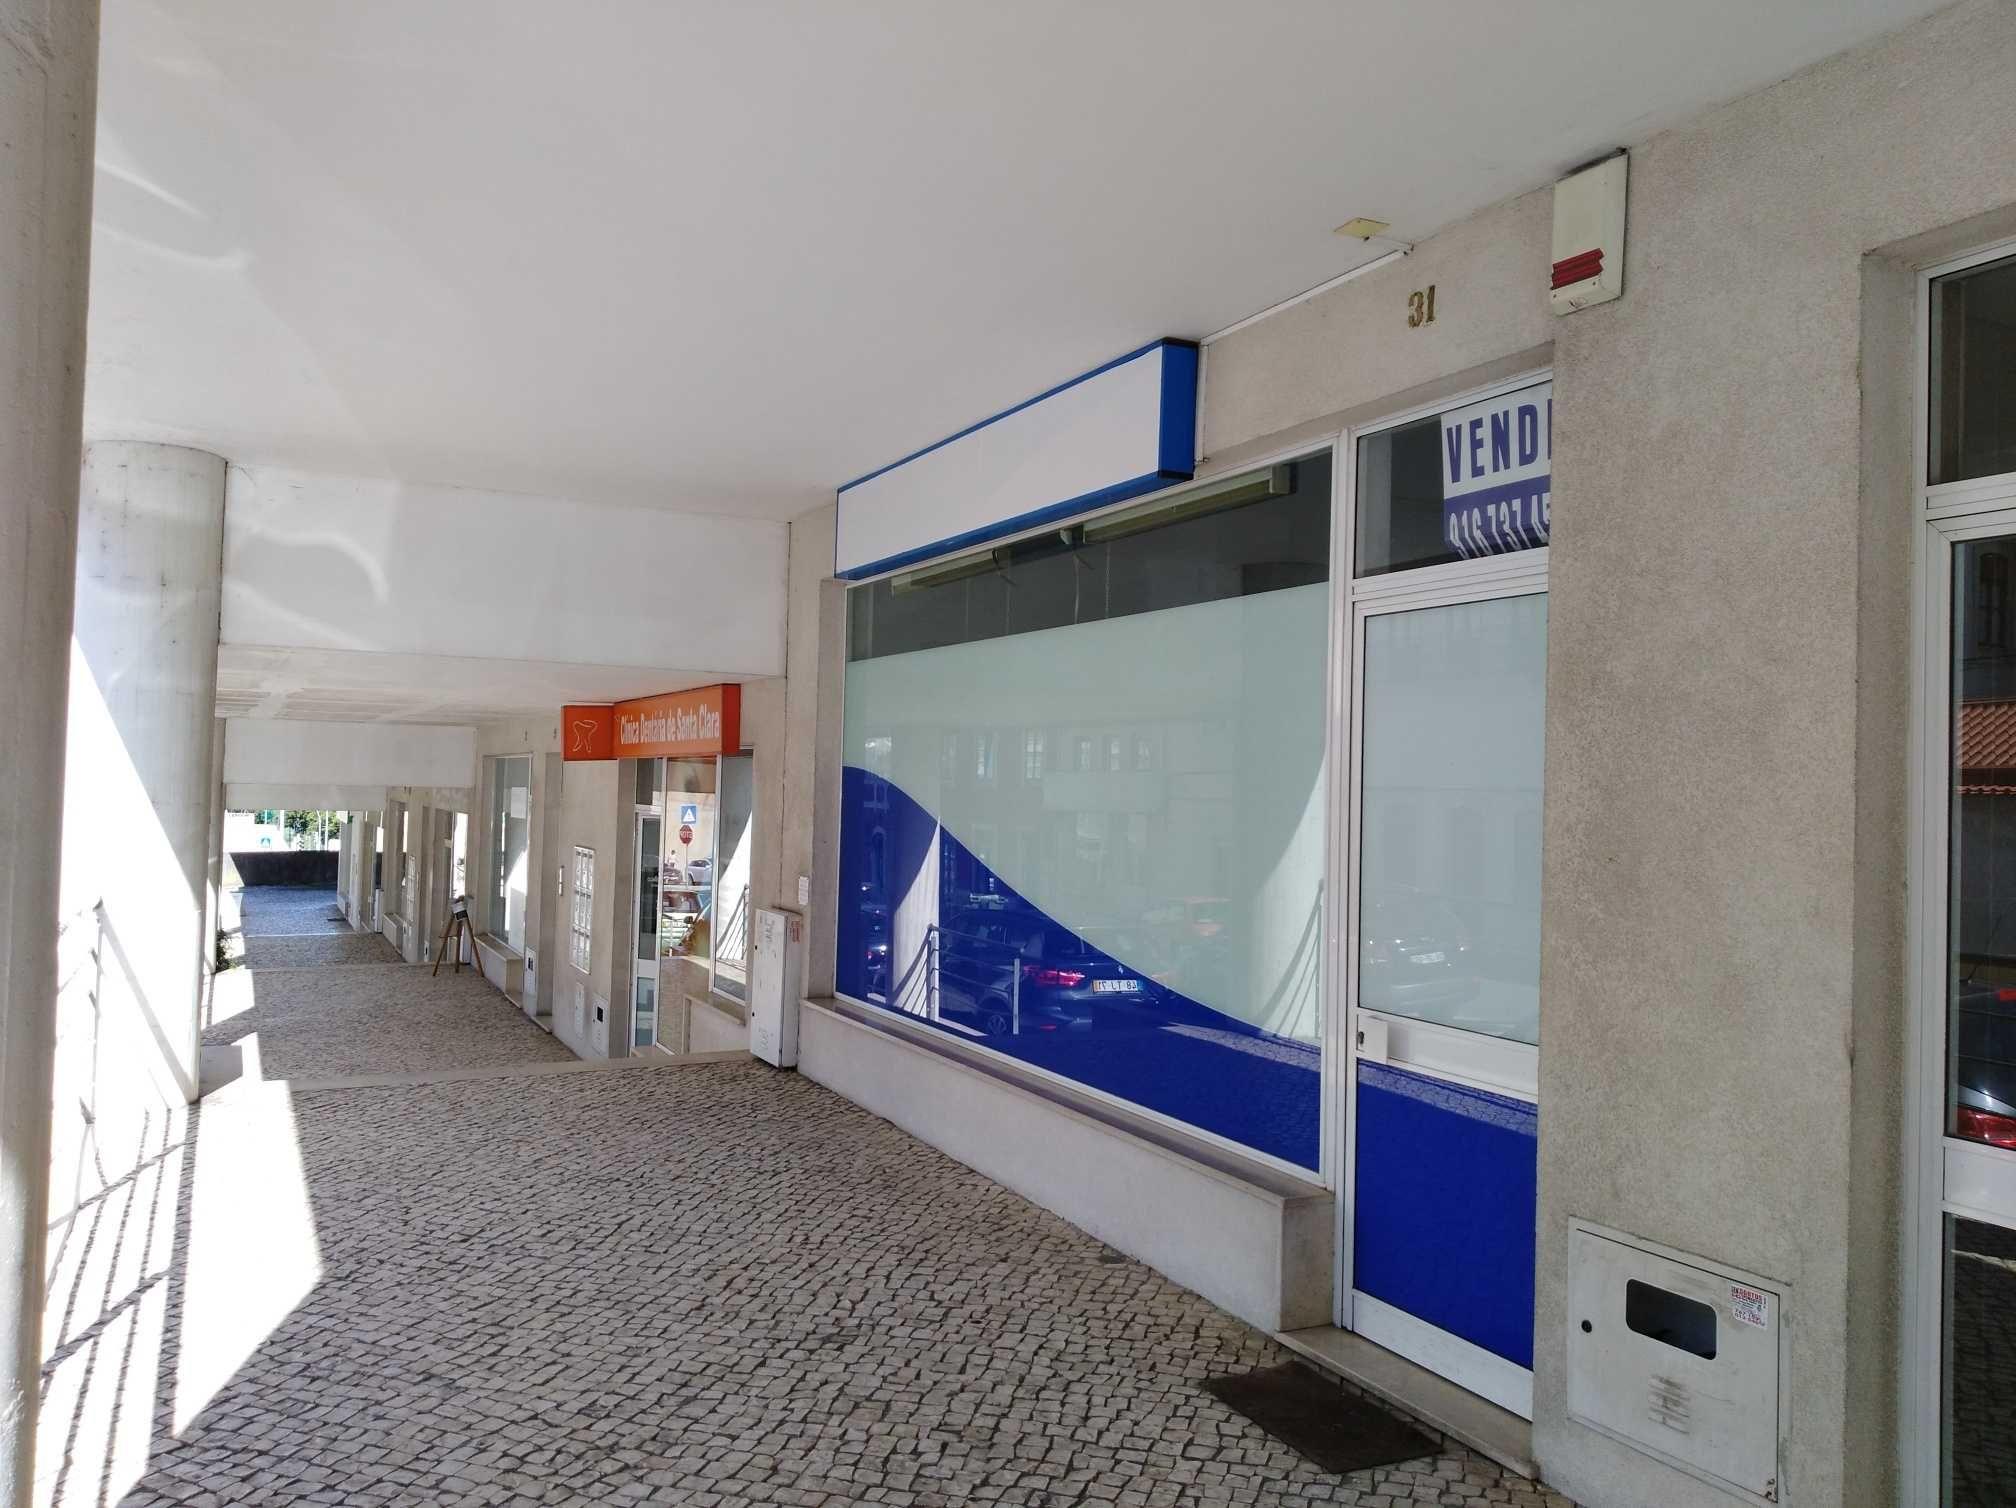 Loja / Escritório, 50 m2, Arrenda 550 € / Vende 110.000 €